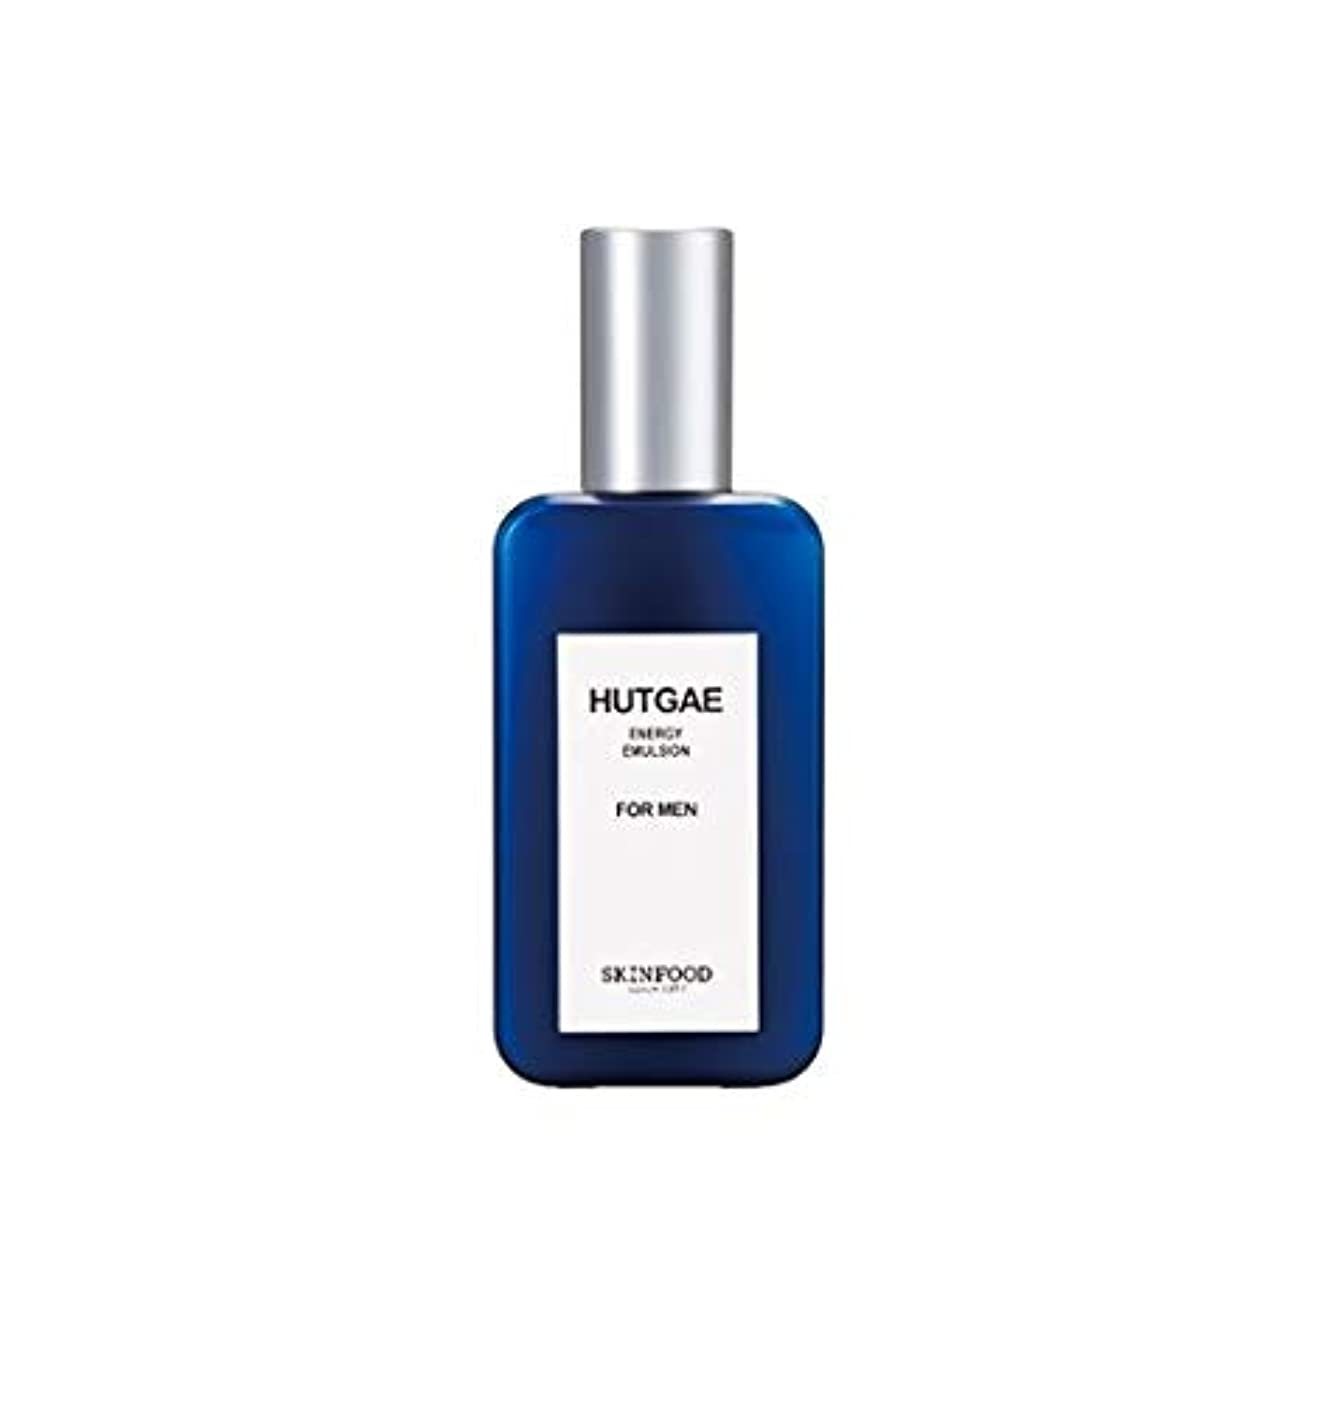 Skinfood 男性用オリエンタルレーズンツリーエネルギーエマルジョン/Oriental Raisin Tree Energy Emulsion For Men 130ml [並行輸入品]